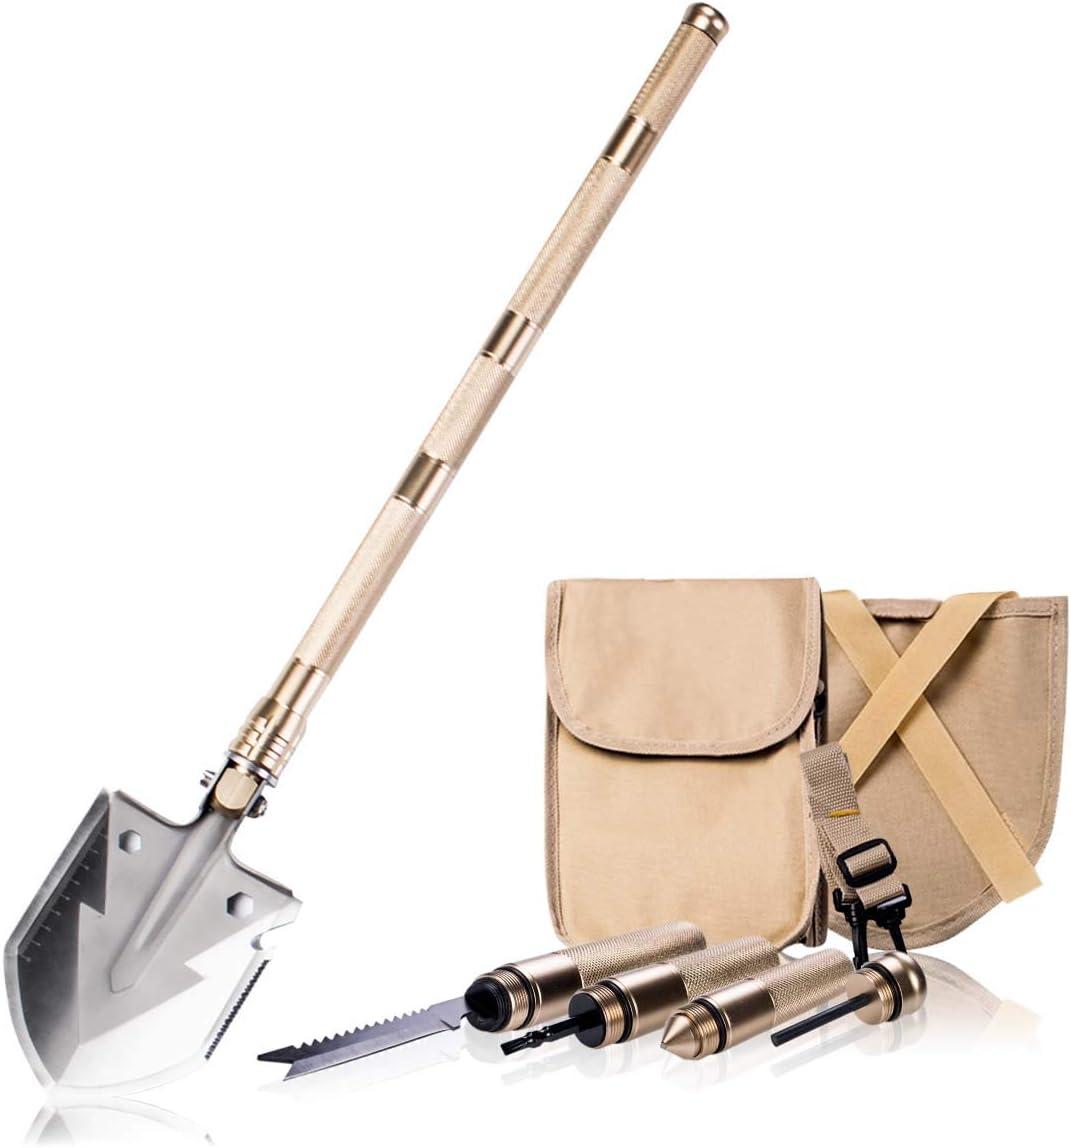 Yansanido 18 inch Folding Shovel Survival Shovel Tri-fold Handle Shovel with Carry Case